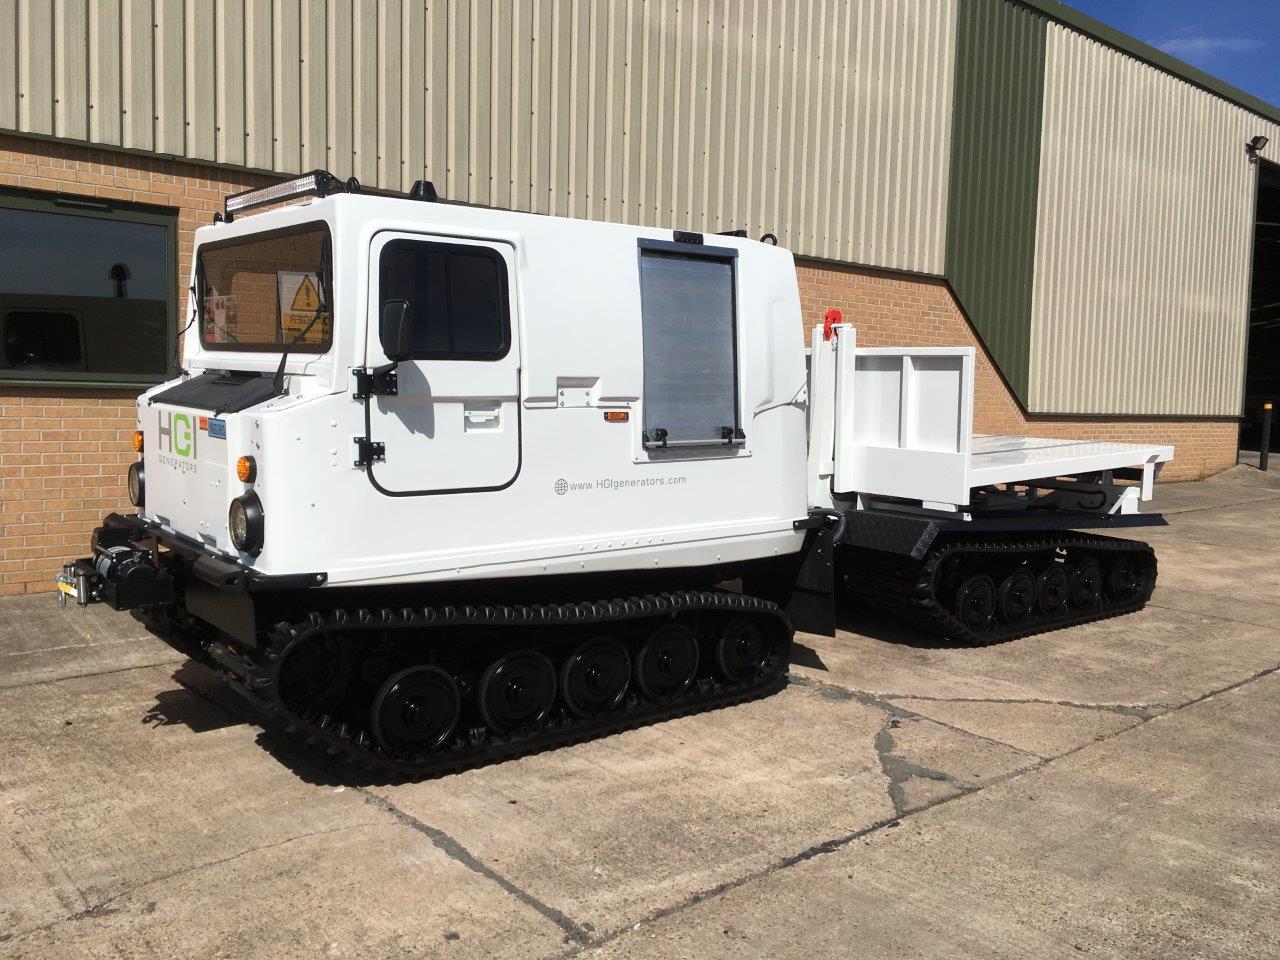 Used  Refurbished Hagglund Bv206 DROPS Body Unit for sale